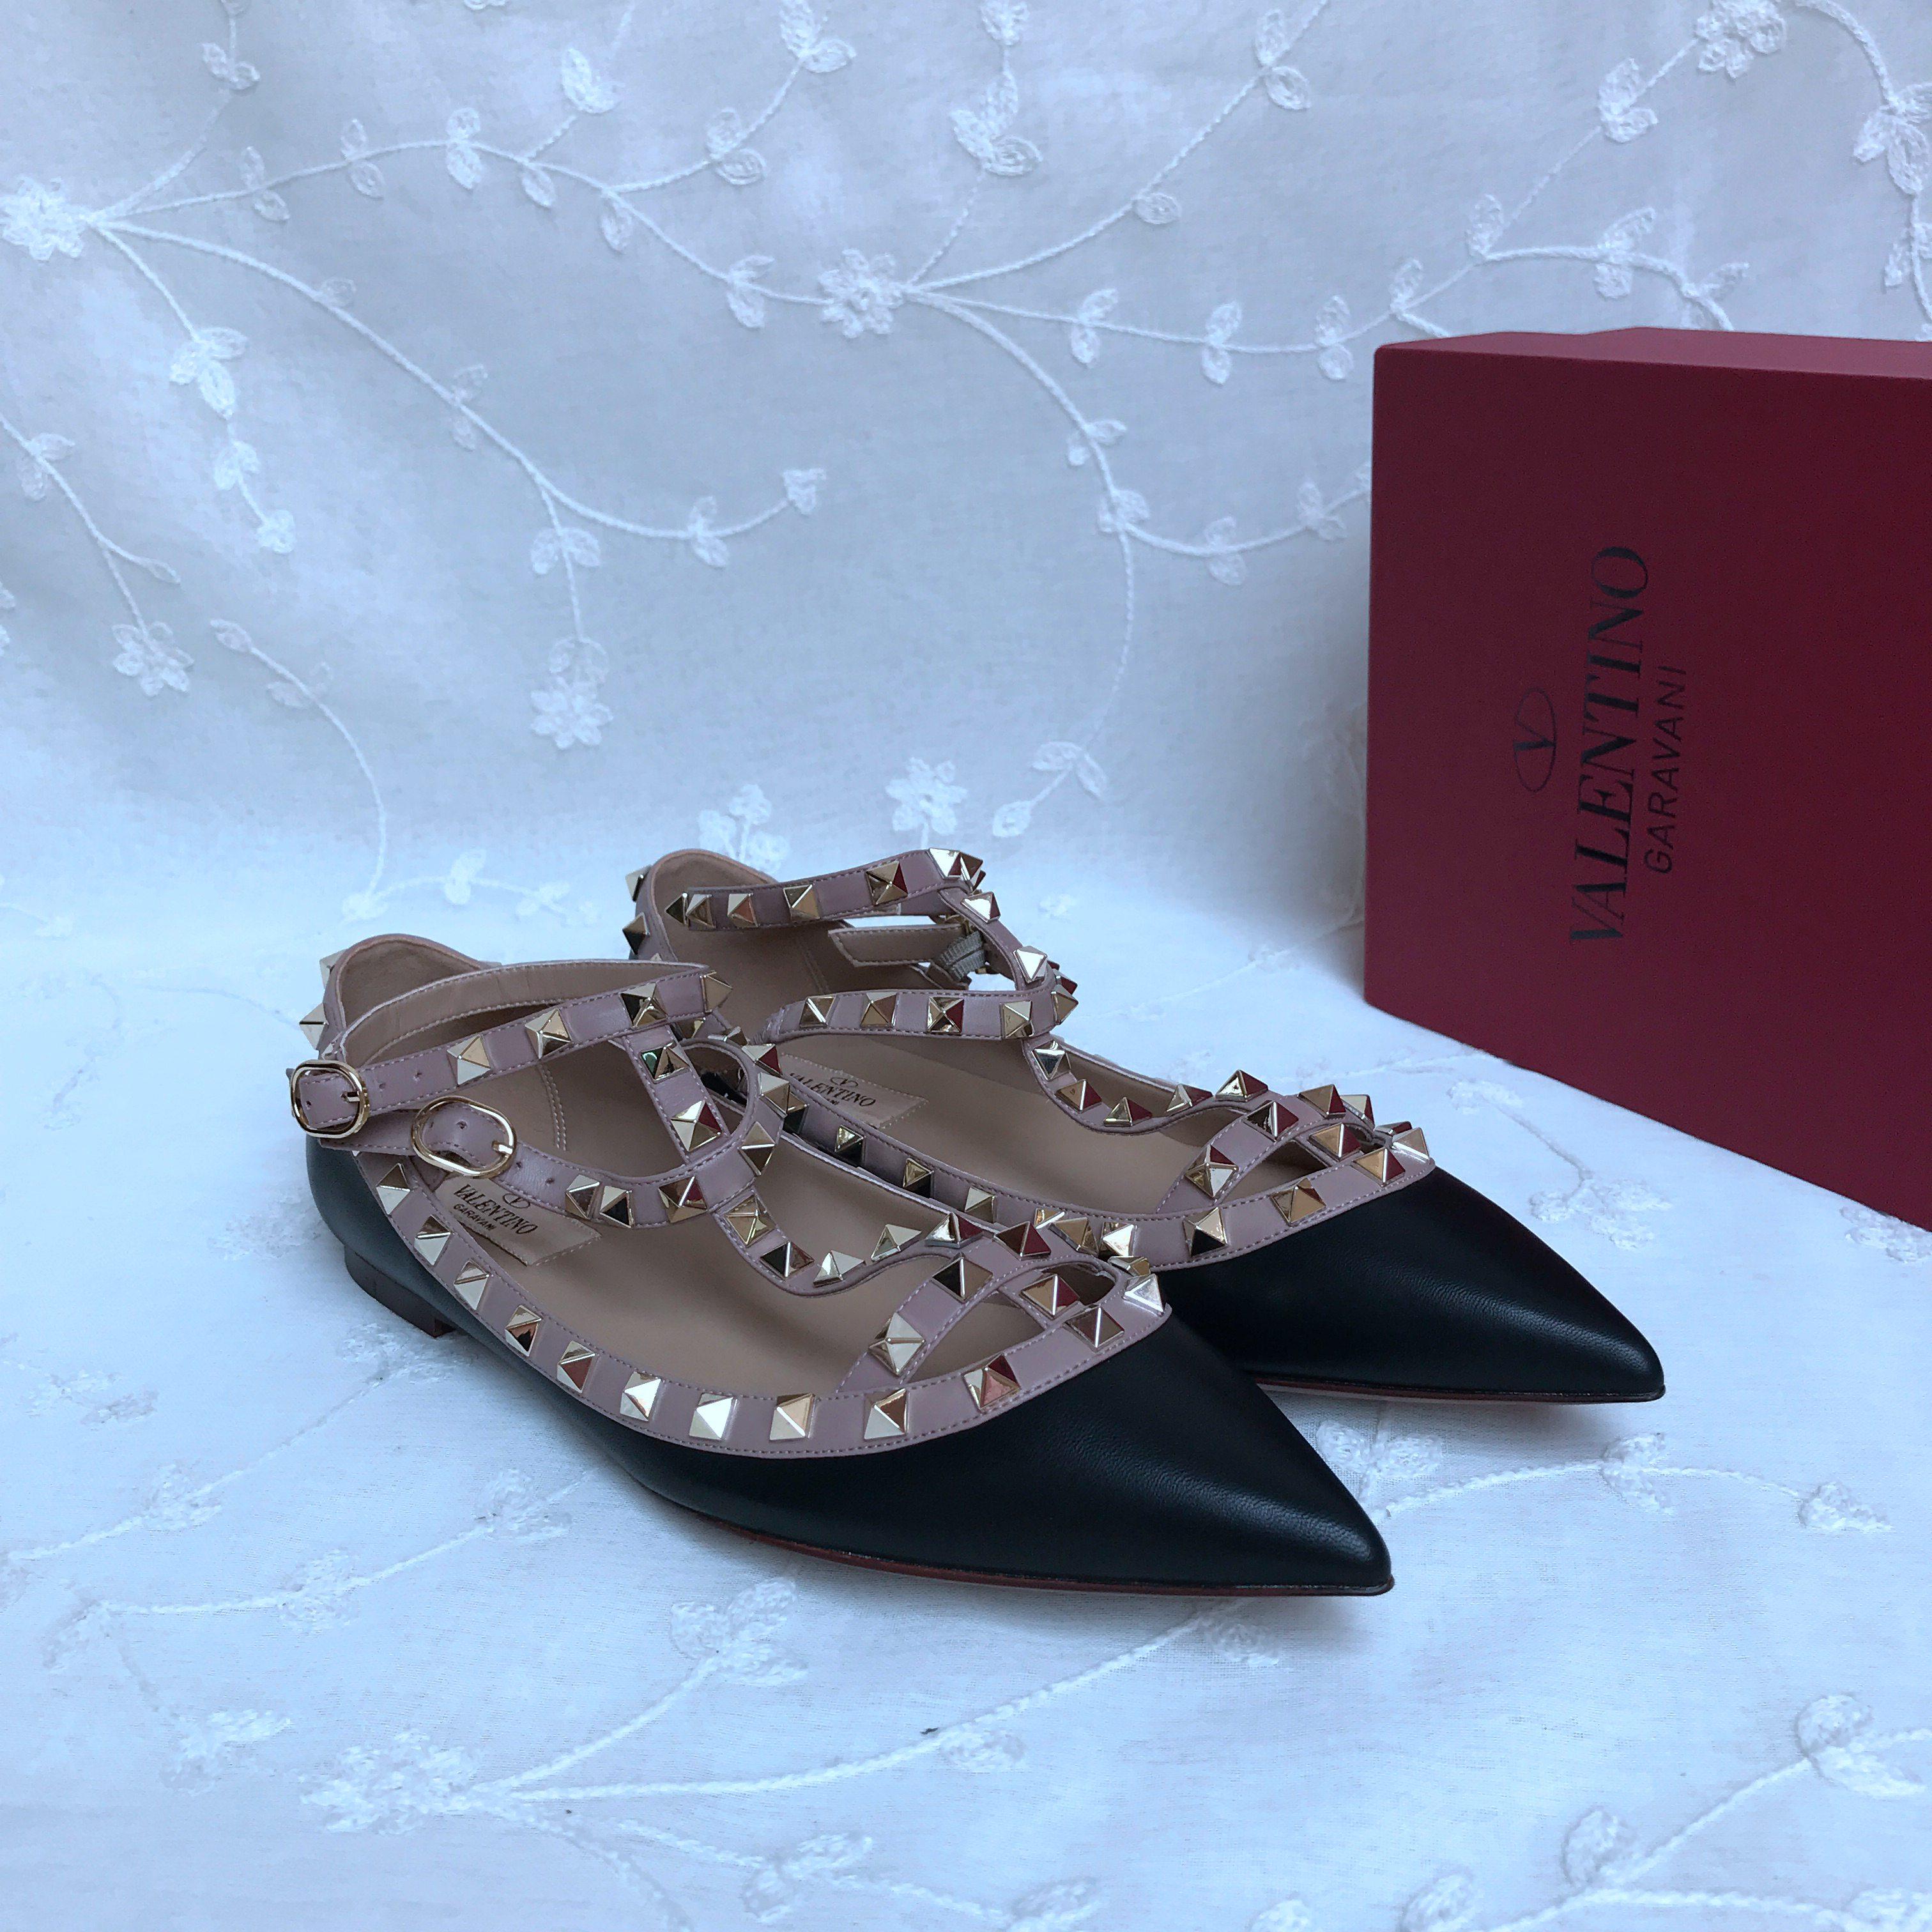 Valentino Classic Flats Shoes 437115